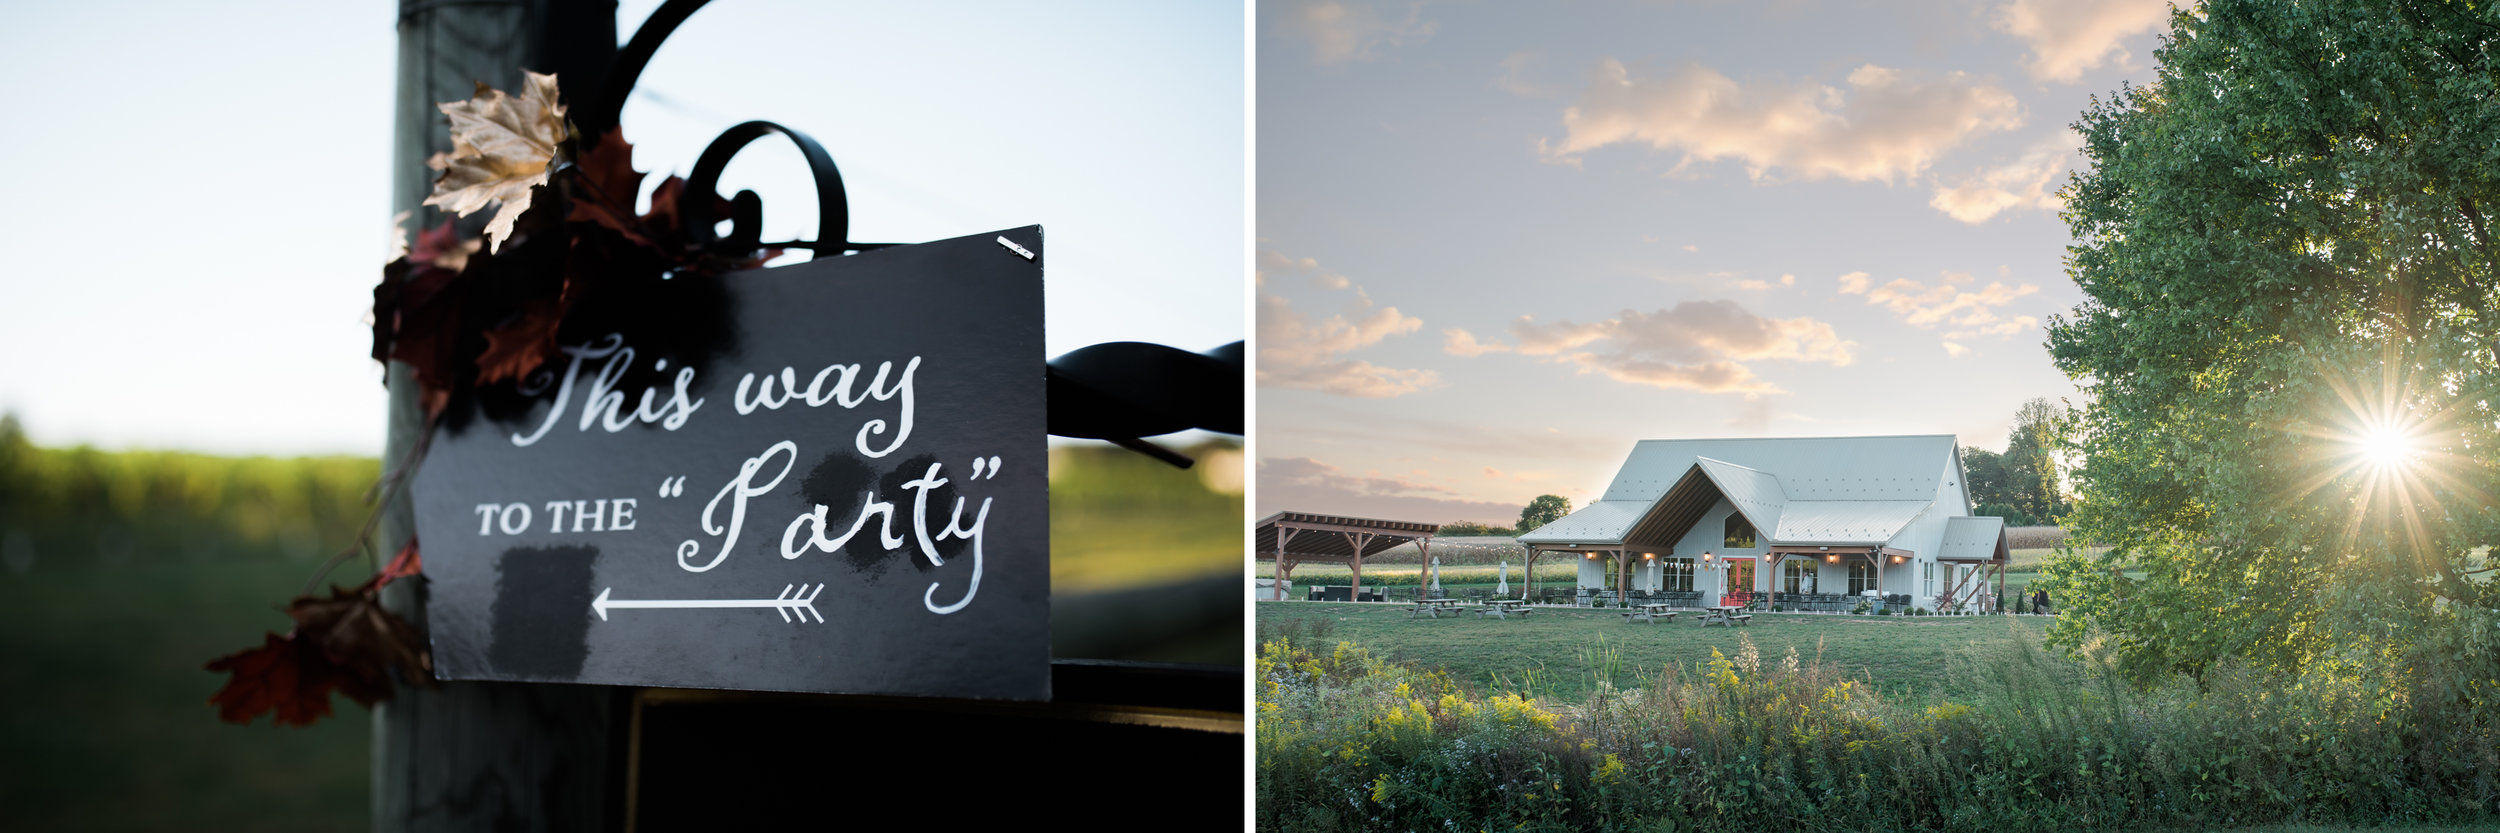 Engagement-Maryland-Winery-photos-by-BKLP-Breanna-Kuhlmann-8.jpg